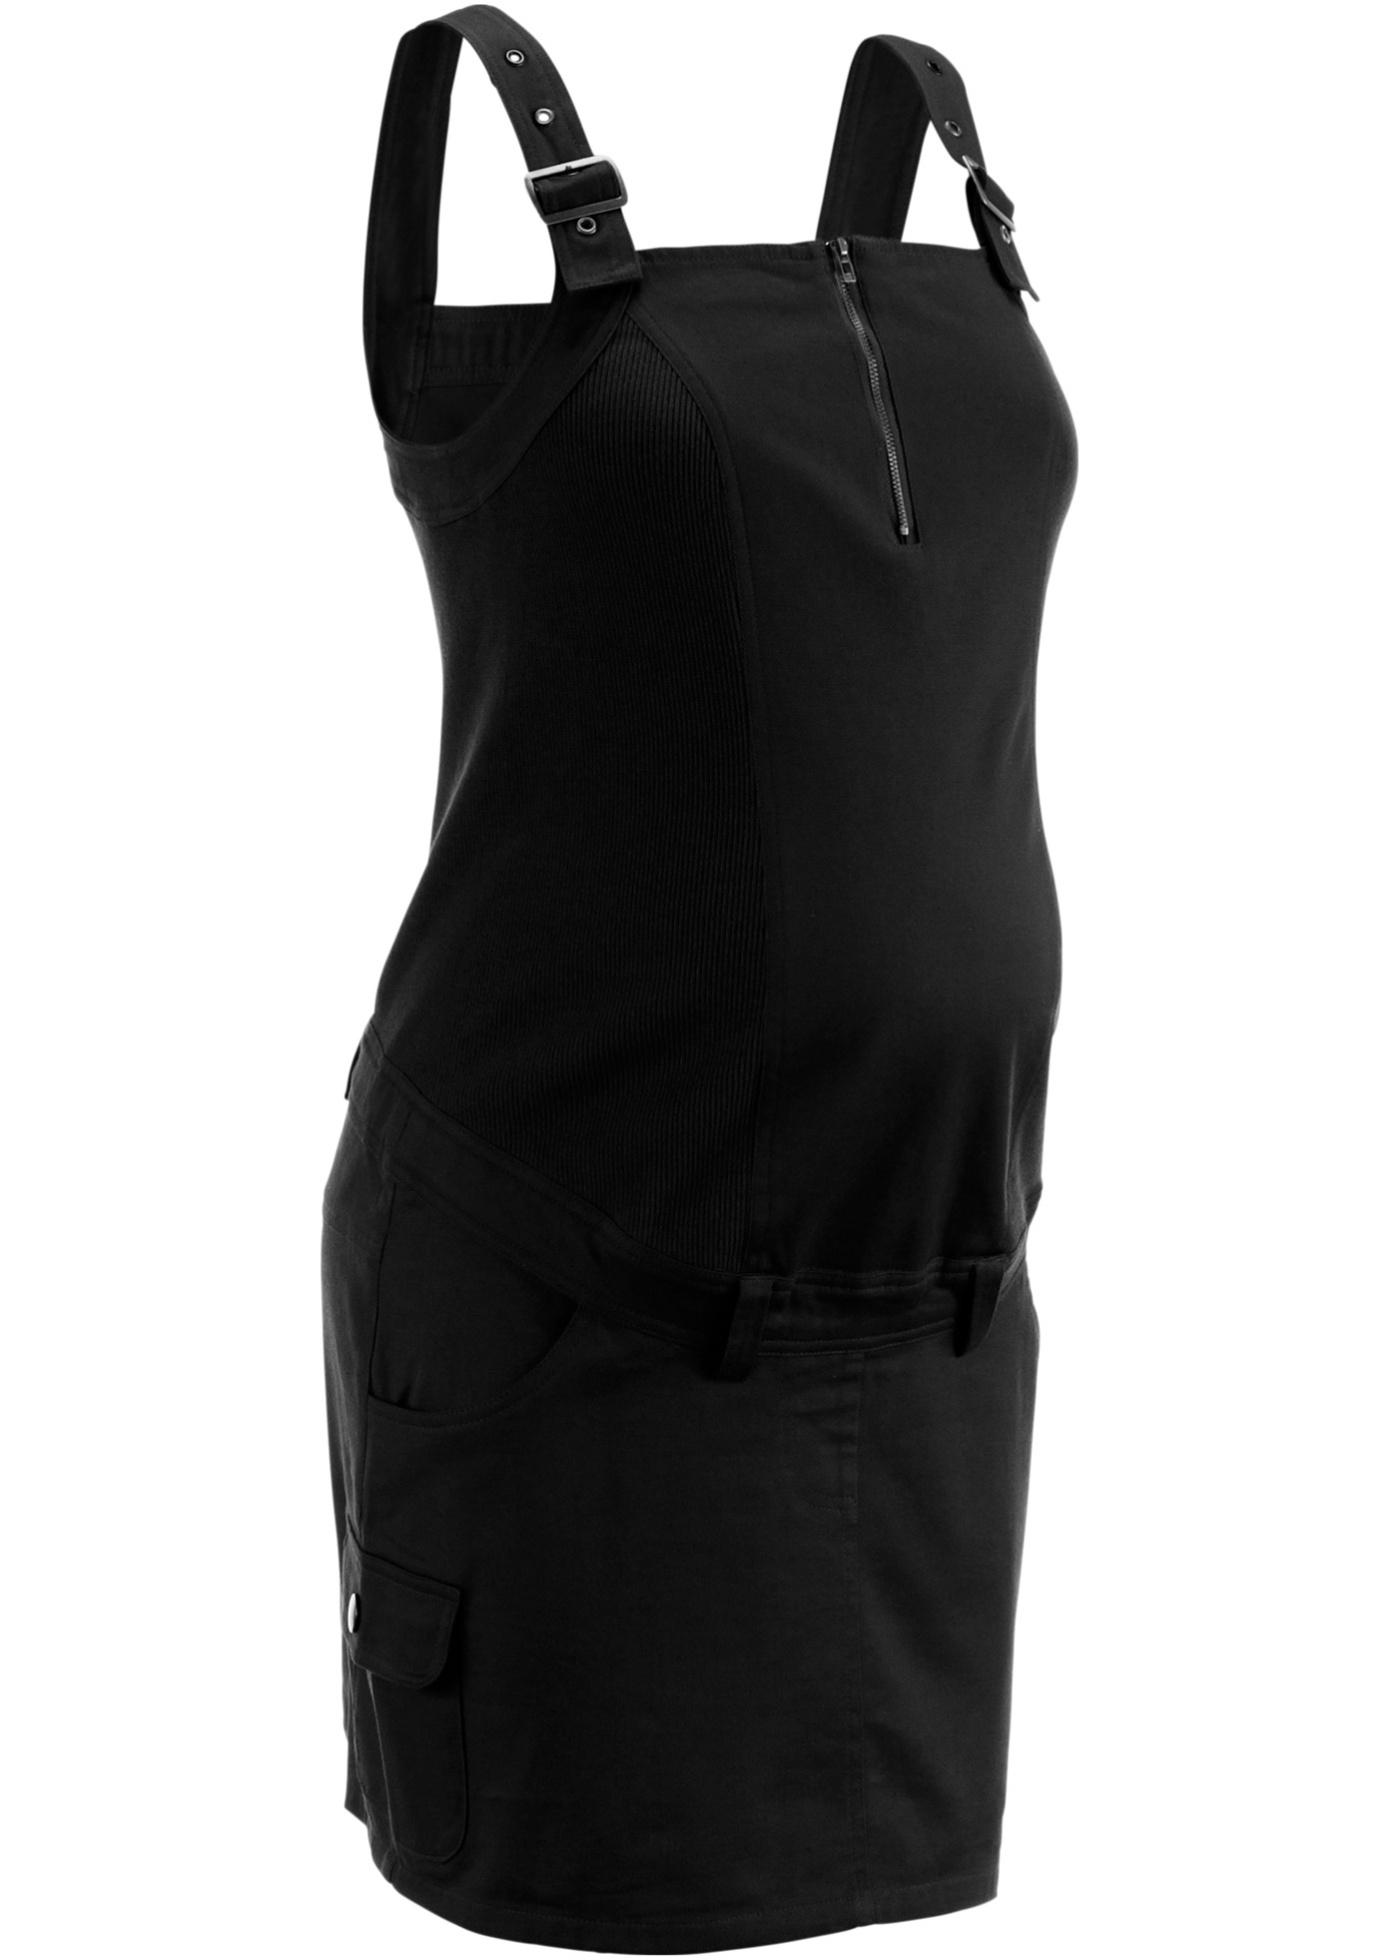 robe grossesse sans manches jusqu 53 v tements femme pureshopping. Black Bedroom Furniture Sets. Home Design Ideas